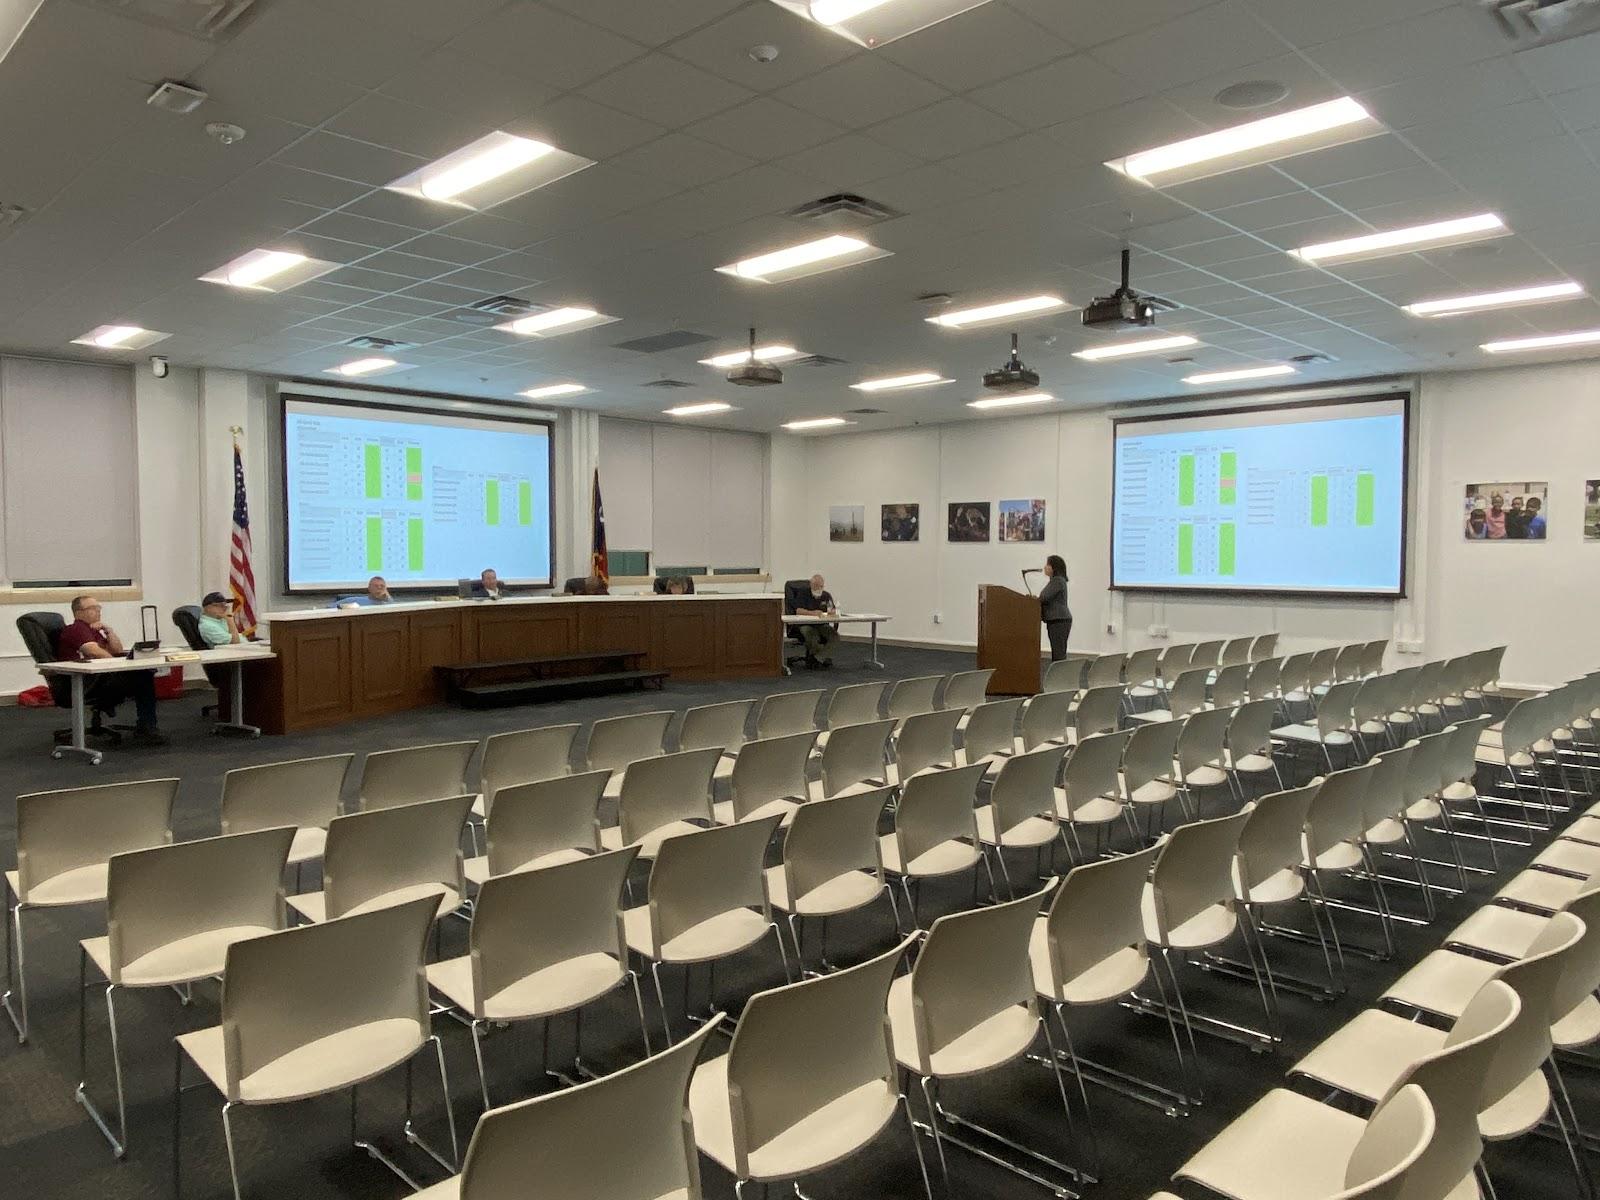 LISD Board meets in empty room